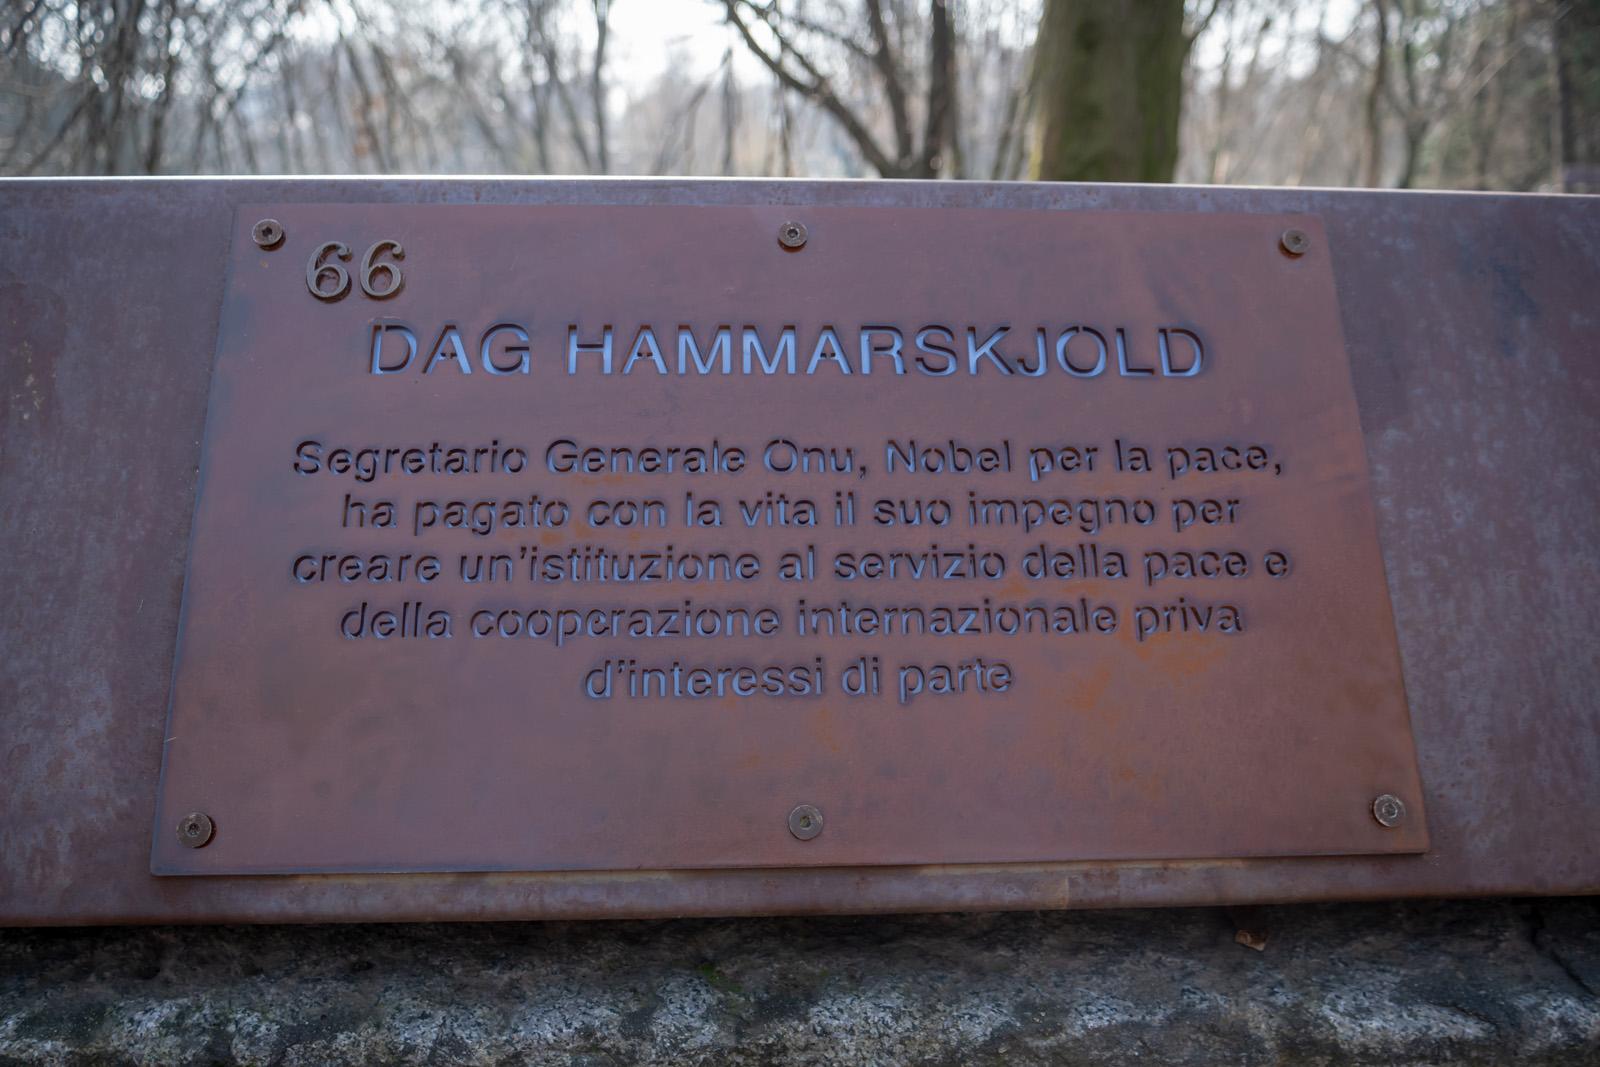 La targa per Dag Hammarskjold